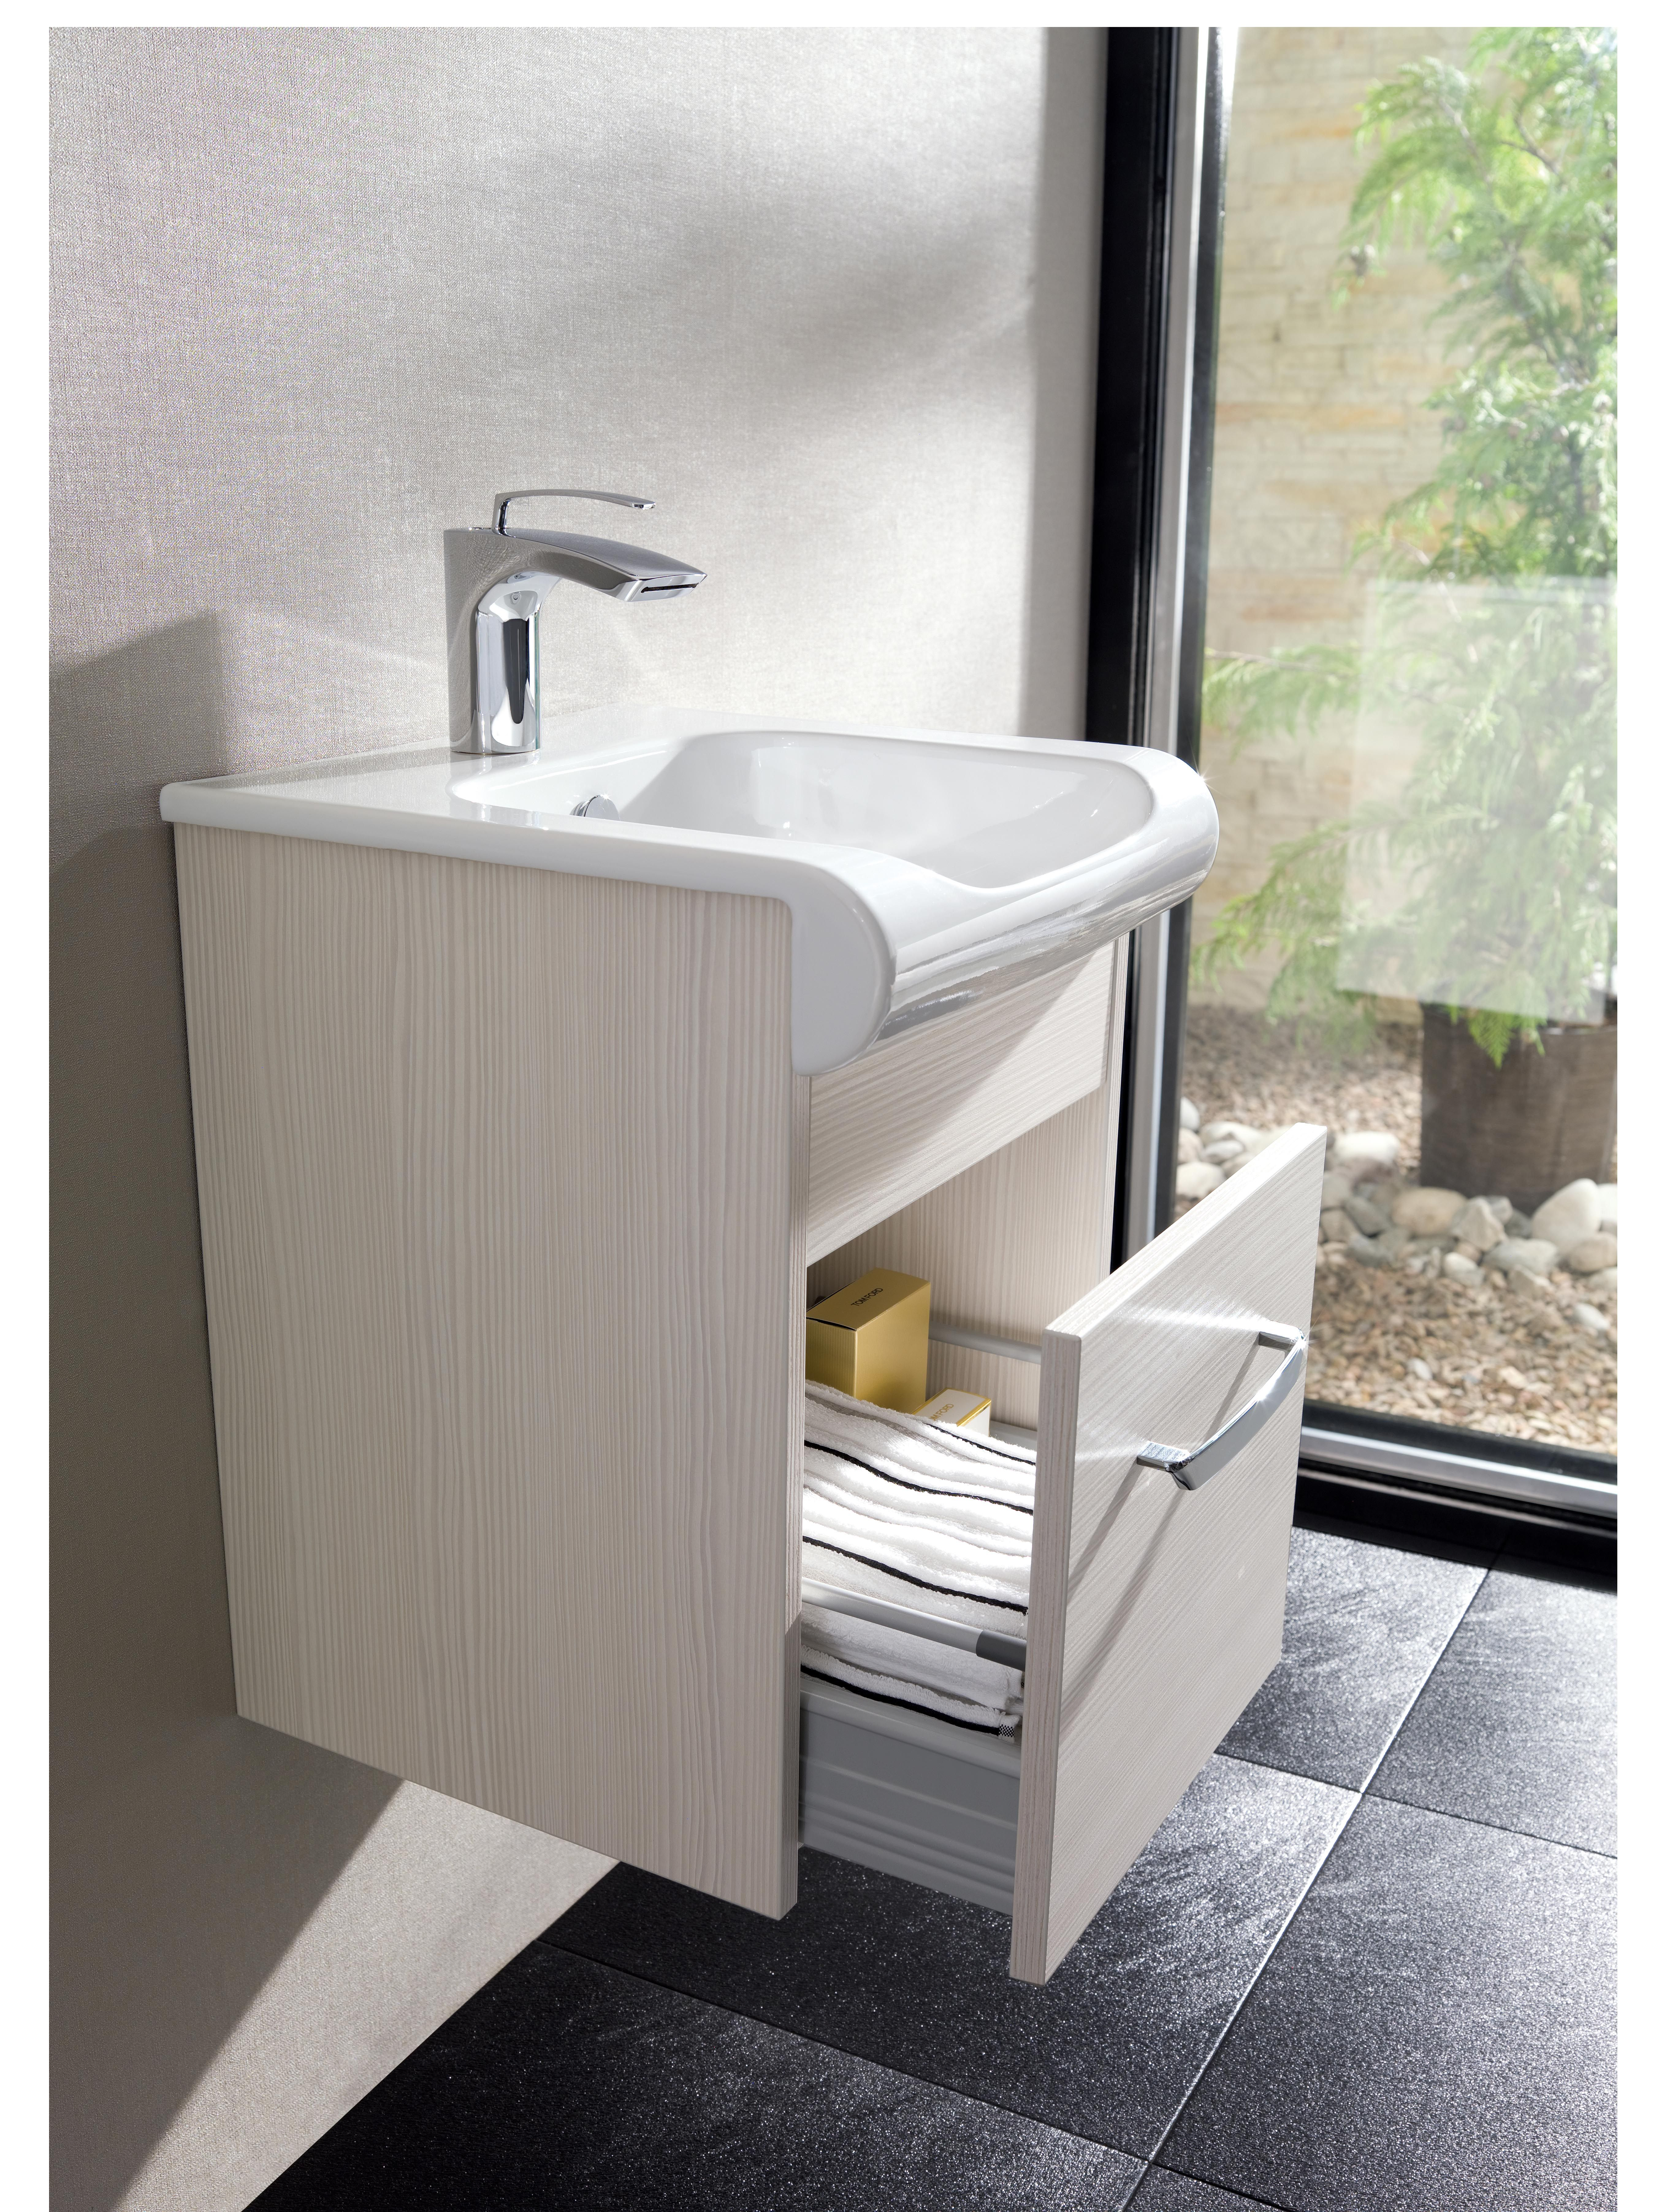 Essence Glacier Bathroom Furniture Range from Crosswater